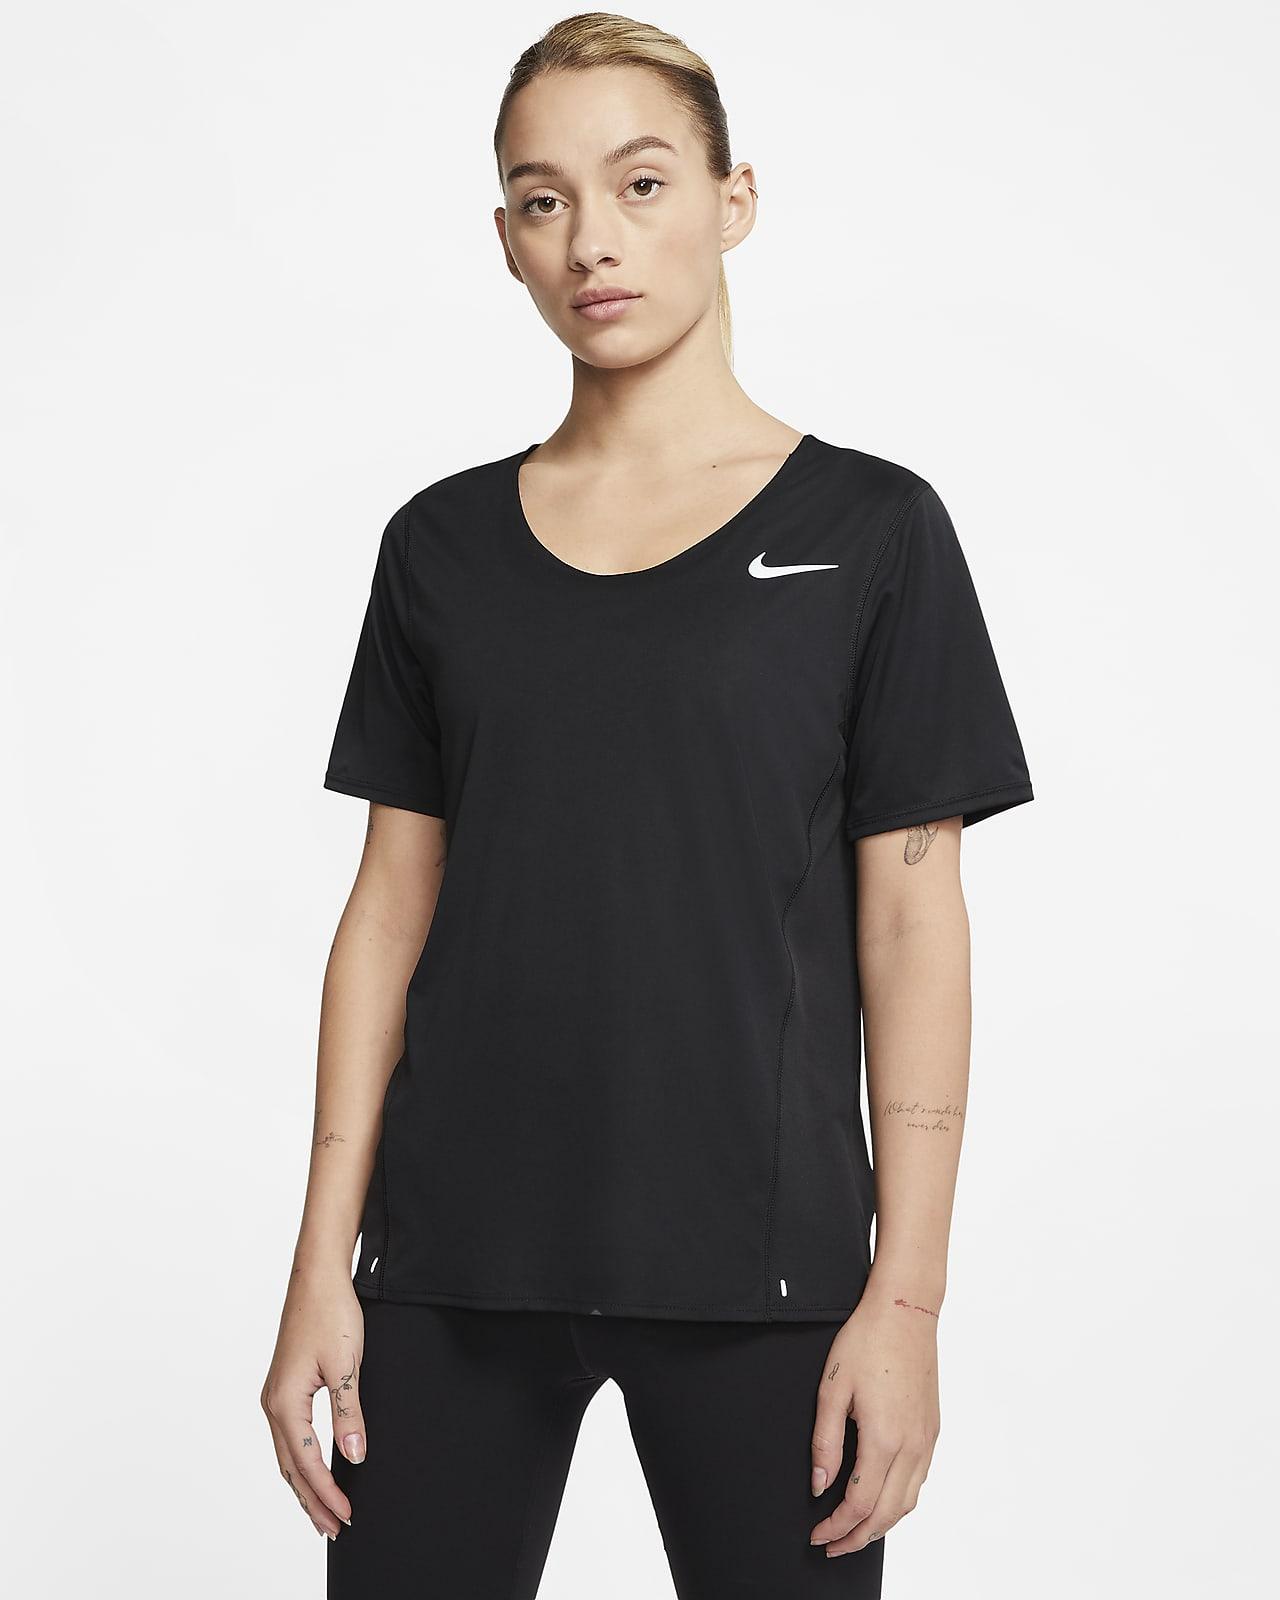 Nike City Sleek Women's Short-Sleeve Running Top